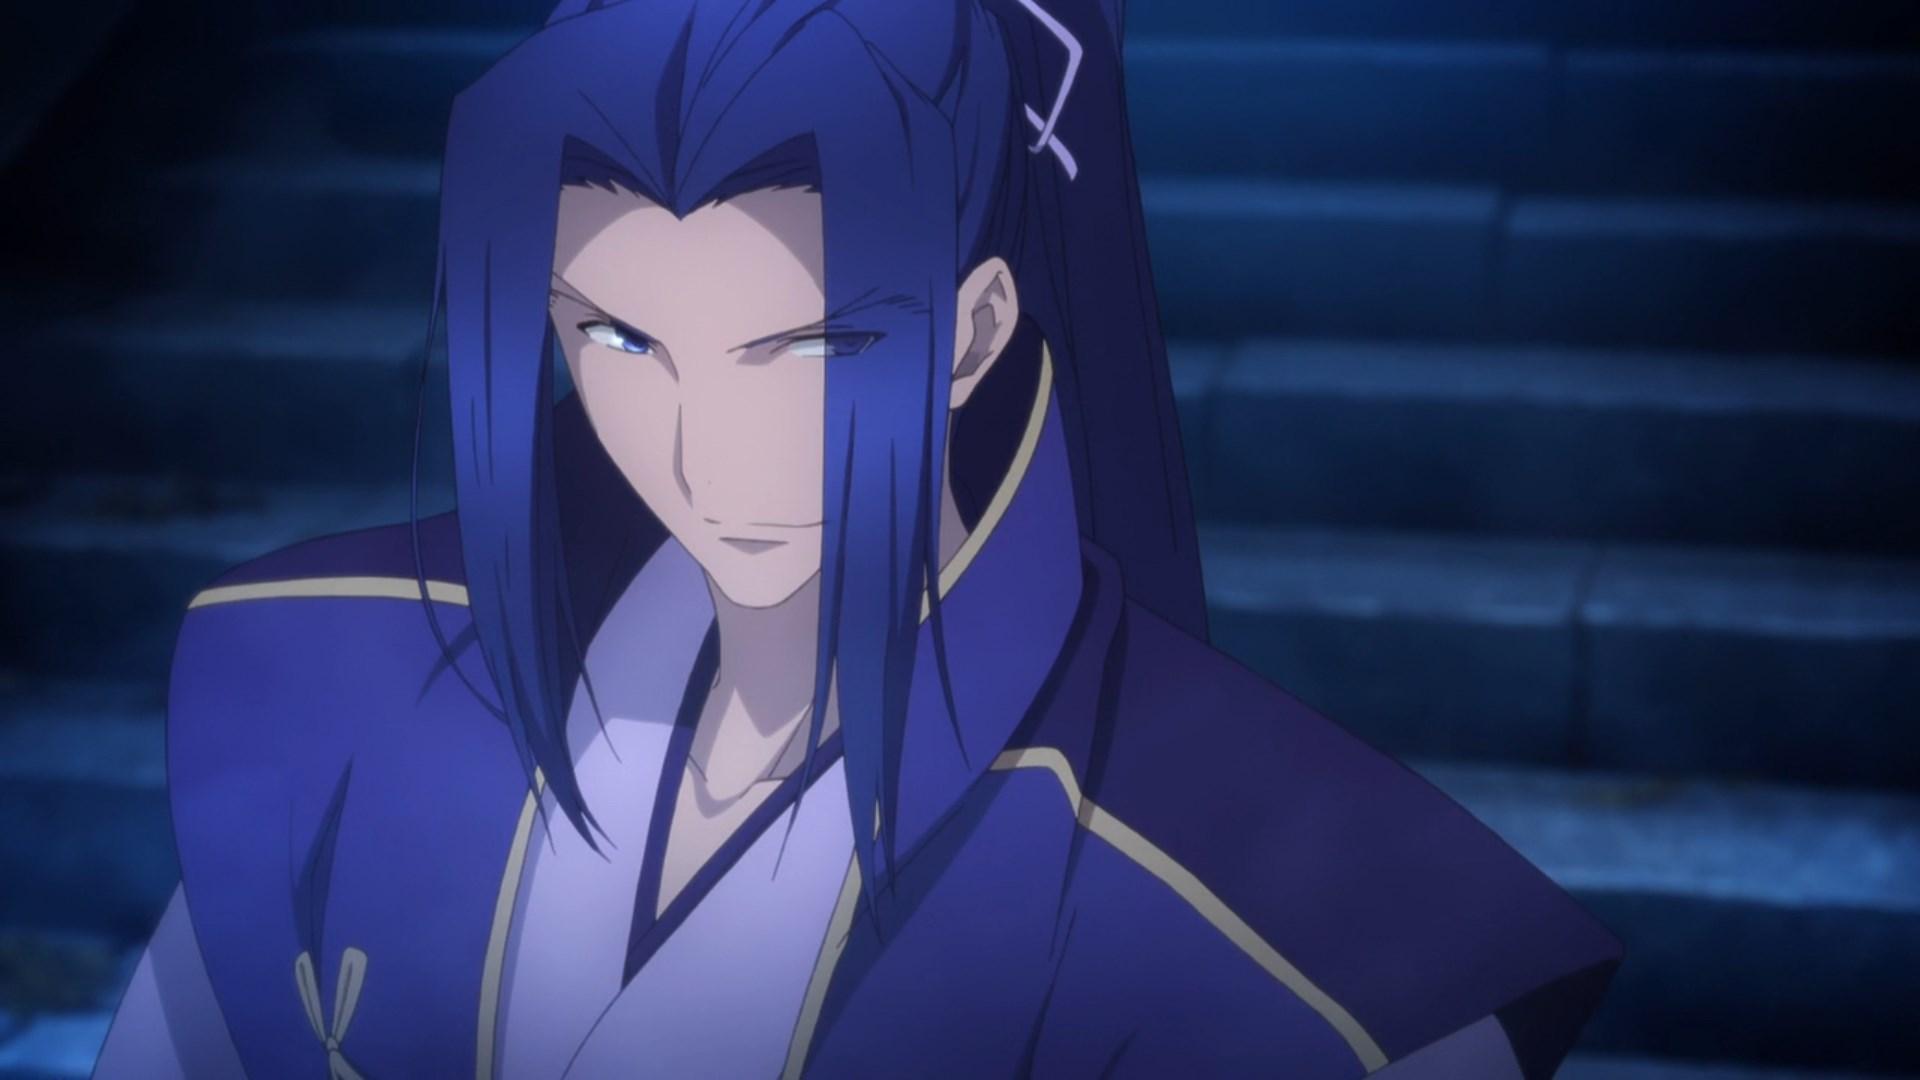 Sasaki Kojiro Fate Stay Night Assassin Vs Diramuid Ua Duibhne Zero Lancer